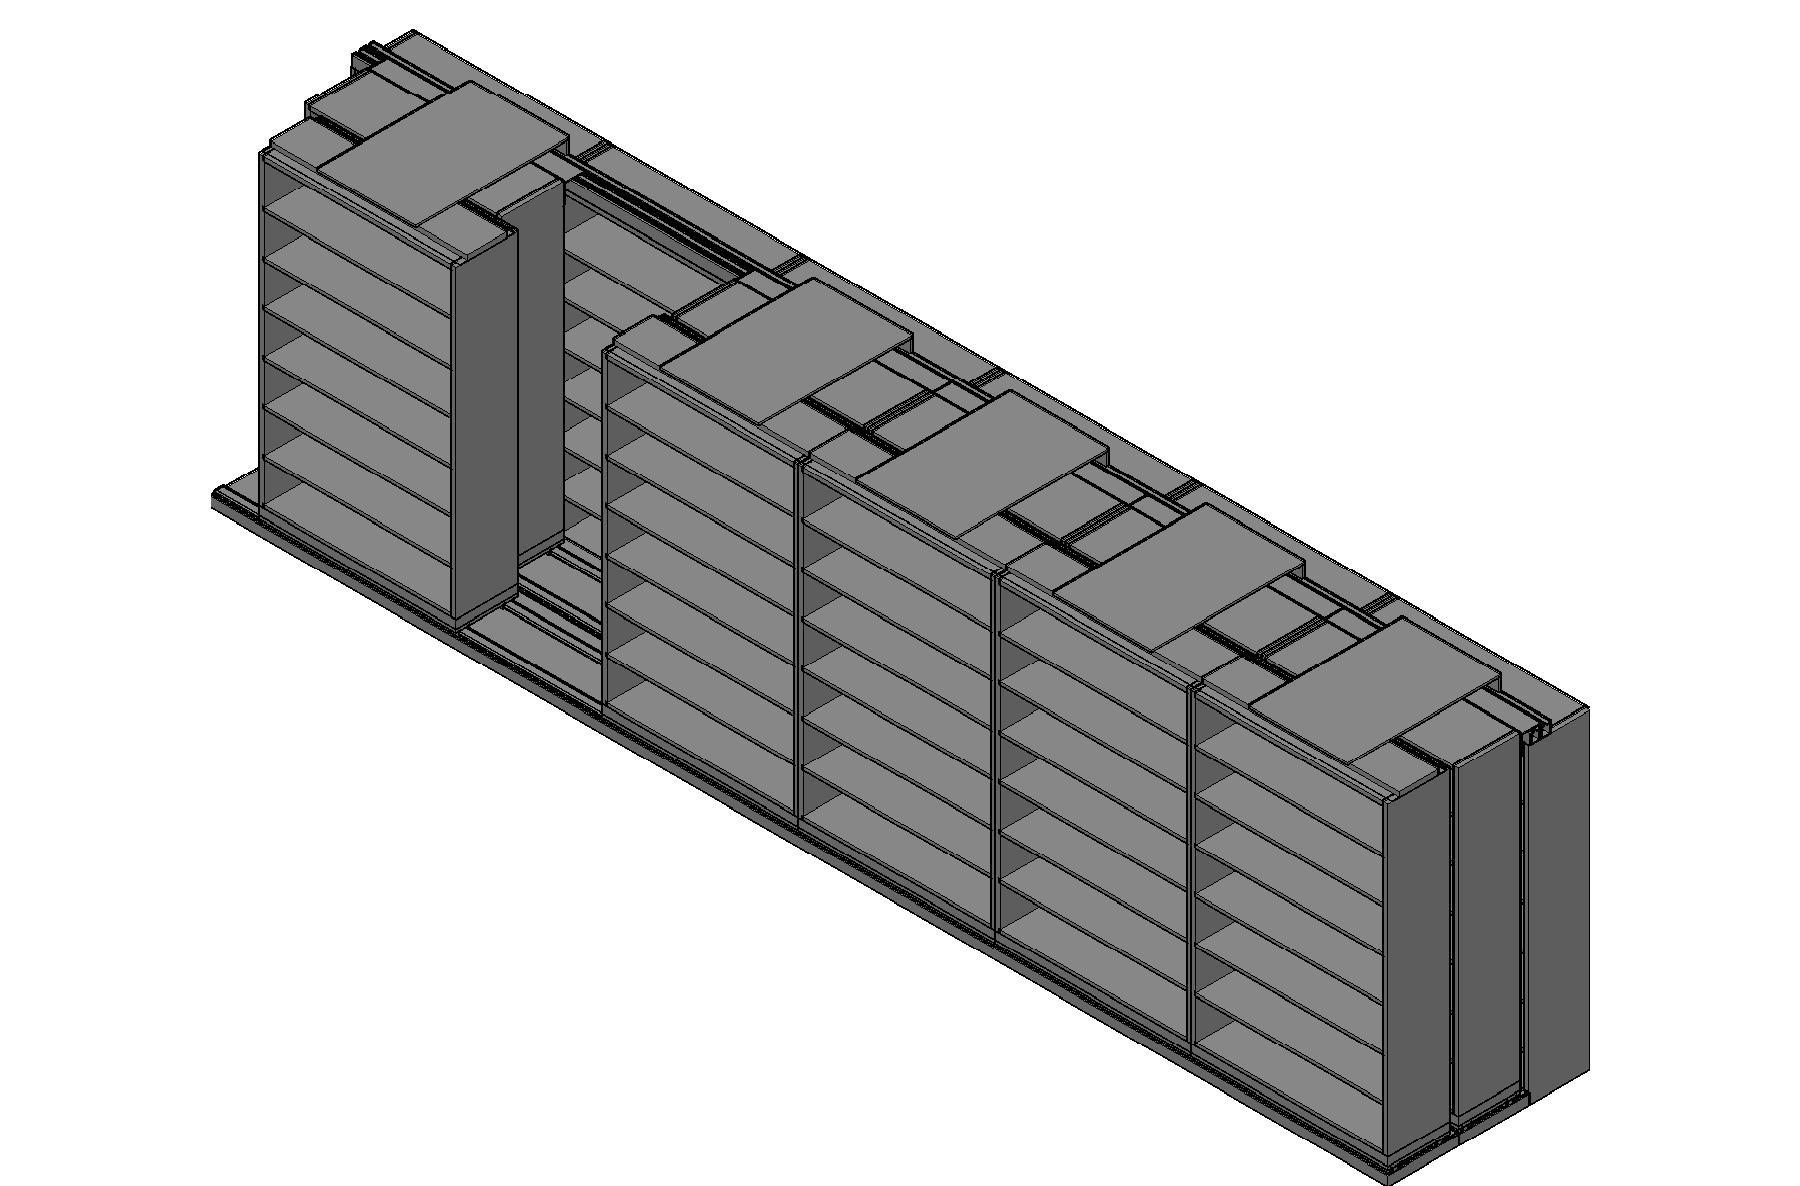 "Legal Size Sliding Shelves - 3 Rows Deep - 7 Levels - (48"" x 15"" Shelves) - 292"" Total Width"